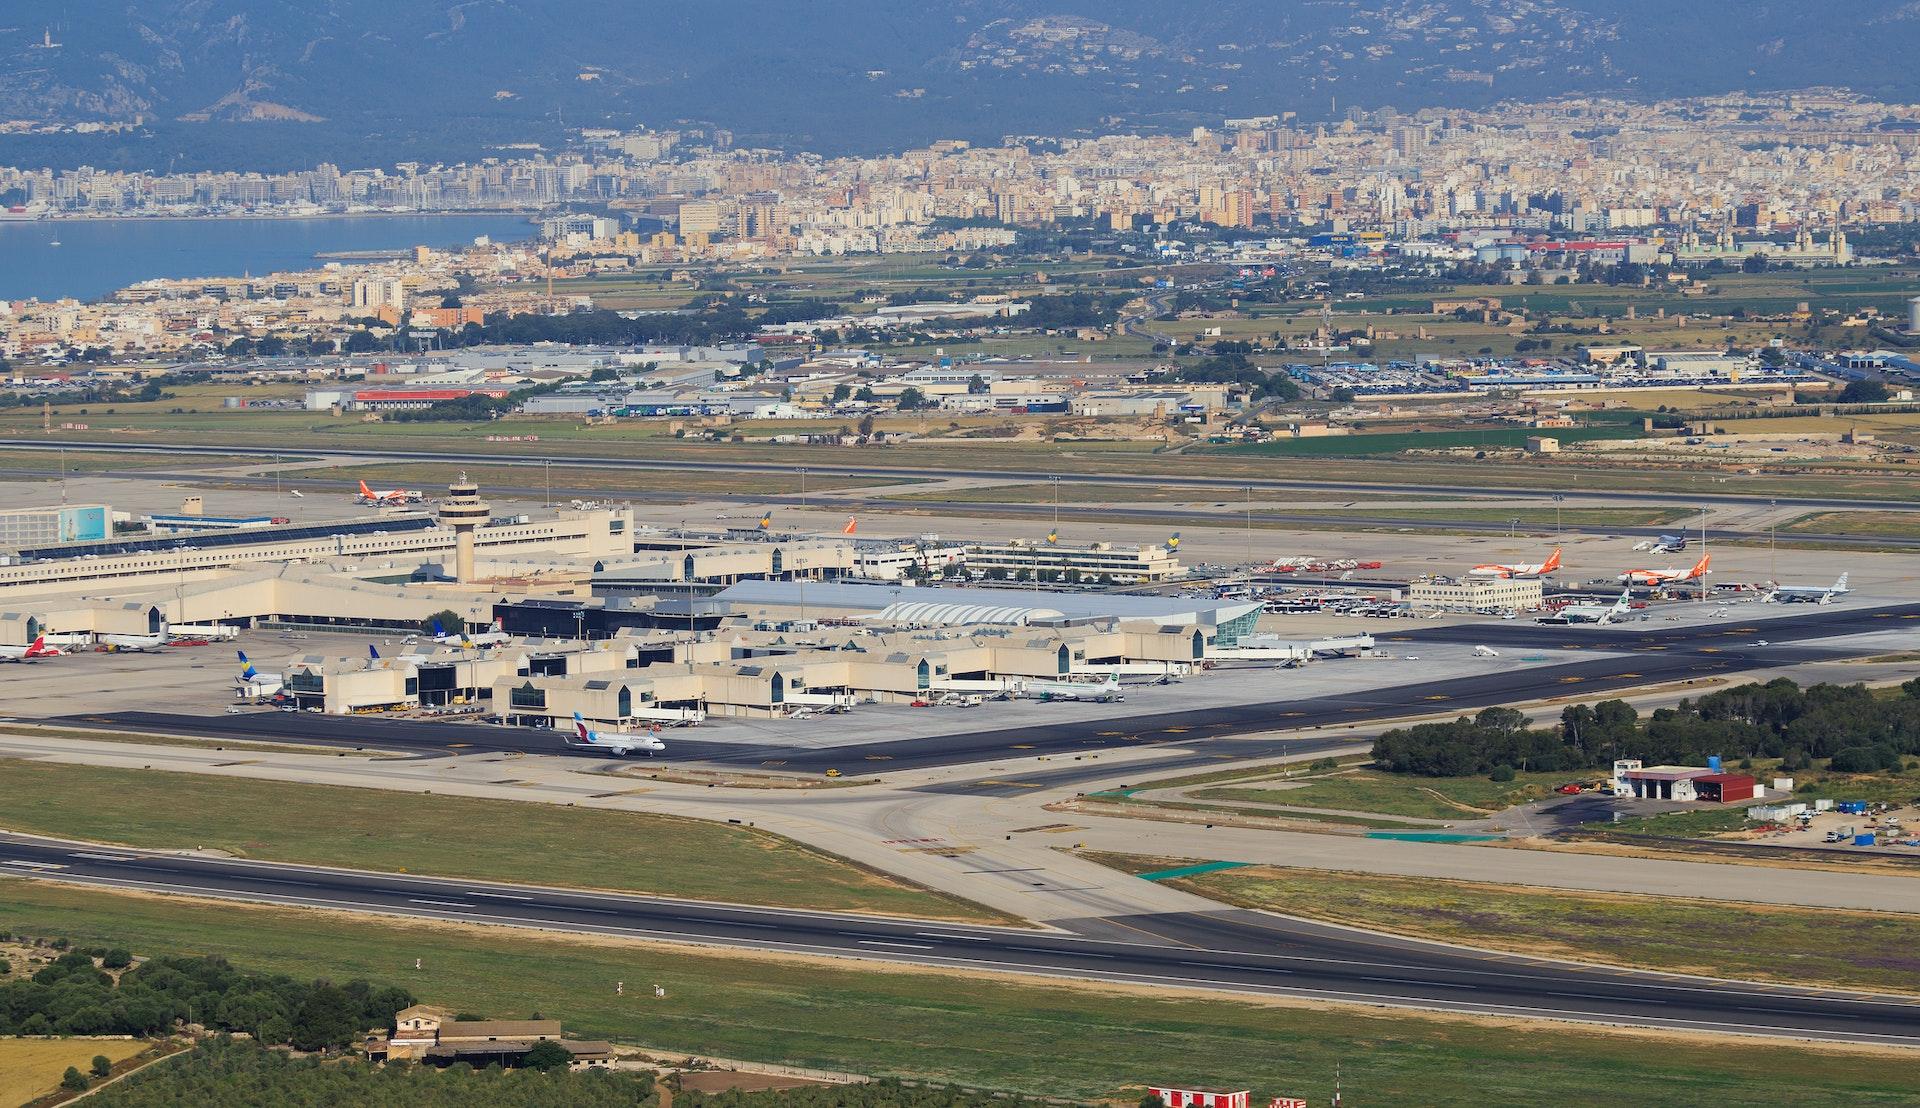 Flyplassen i Palma de Mallorca © Mike Fuchslocher, Getty Images